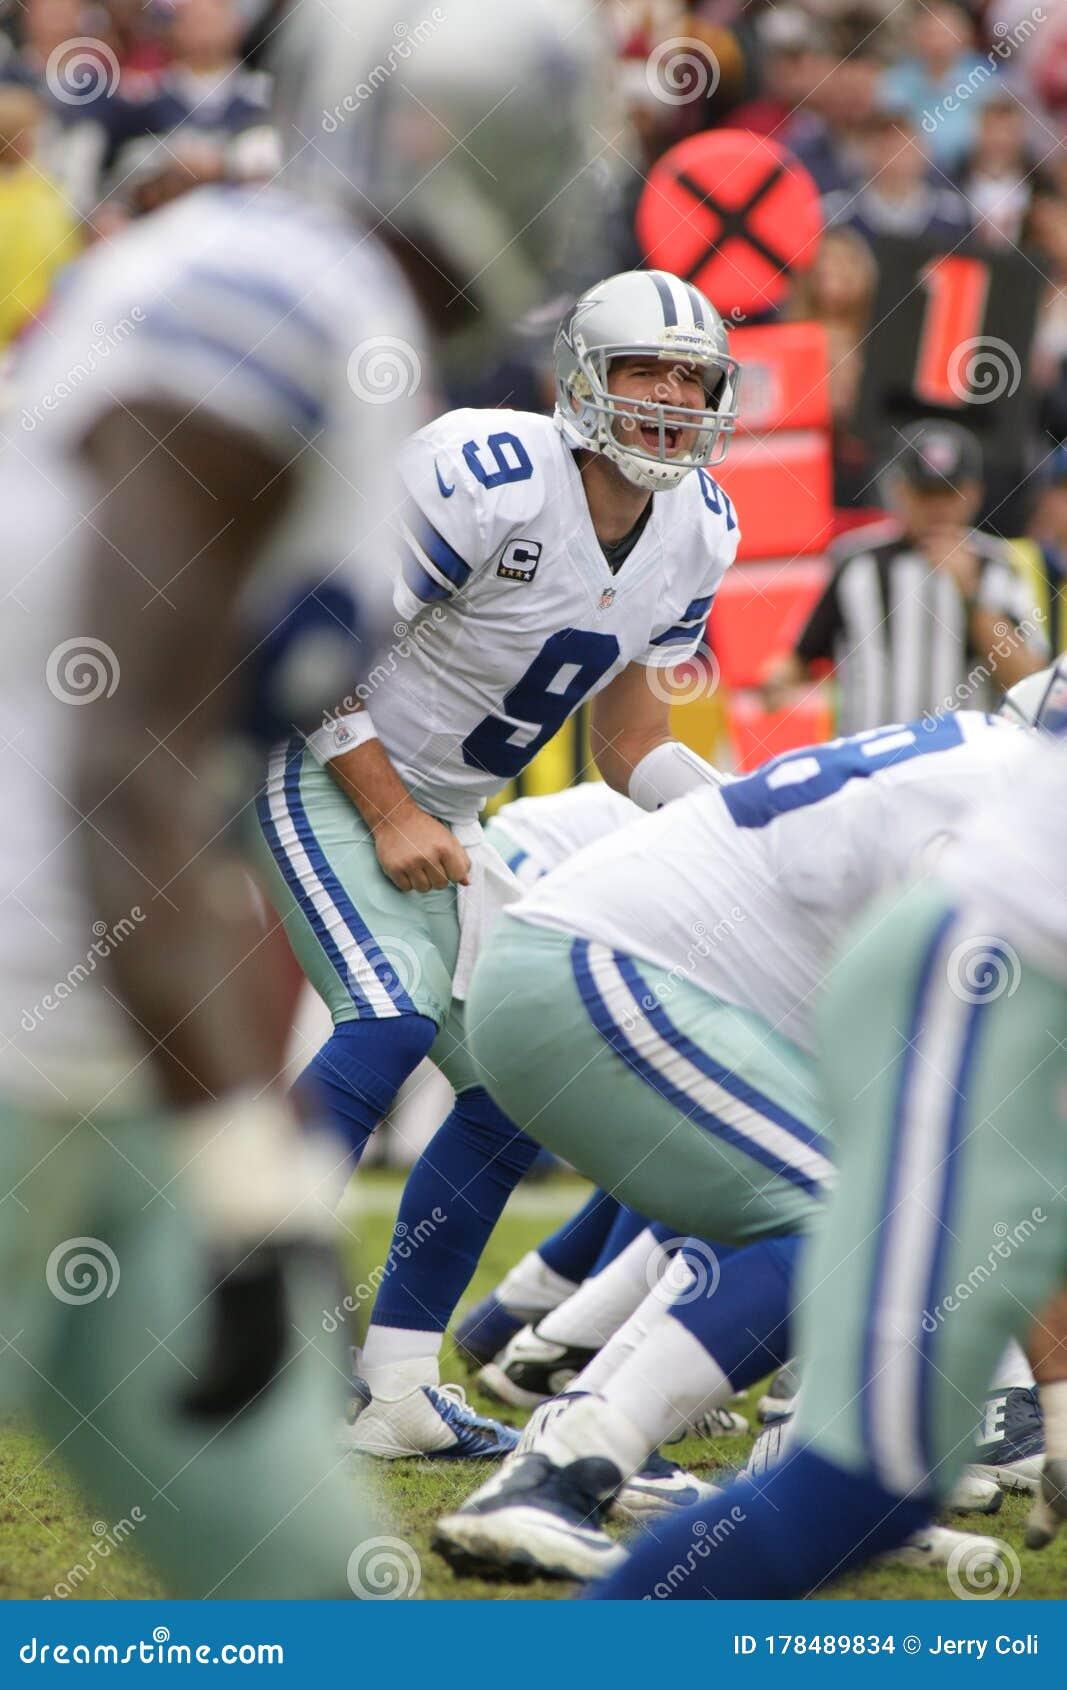 Is Dallas Cowboys quarterback Tony Romo a Hall of Famer?